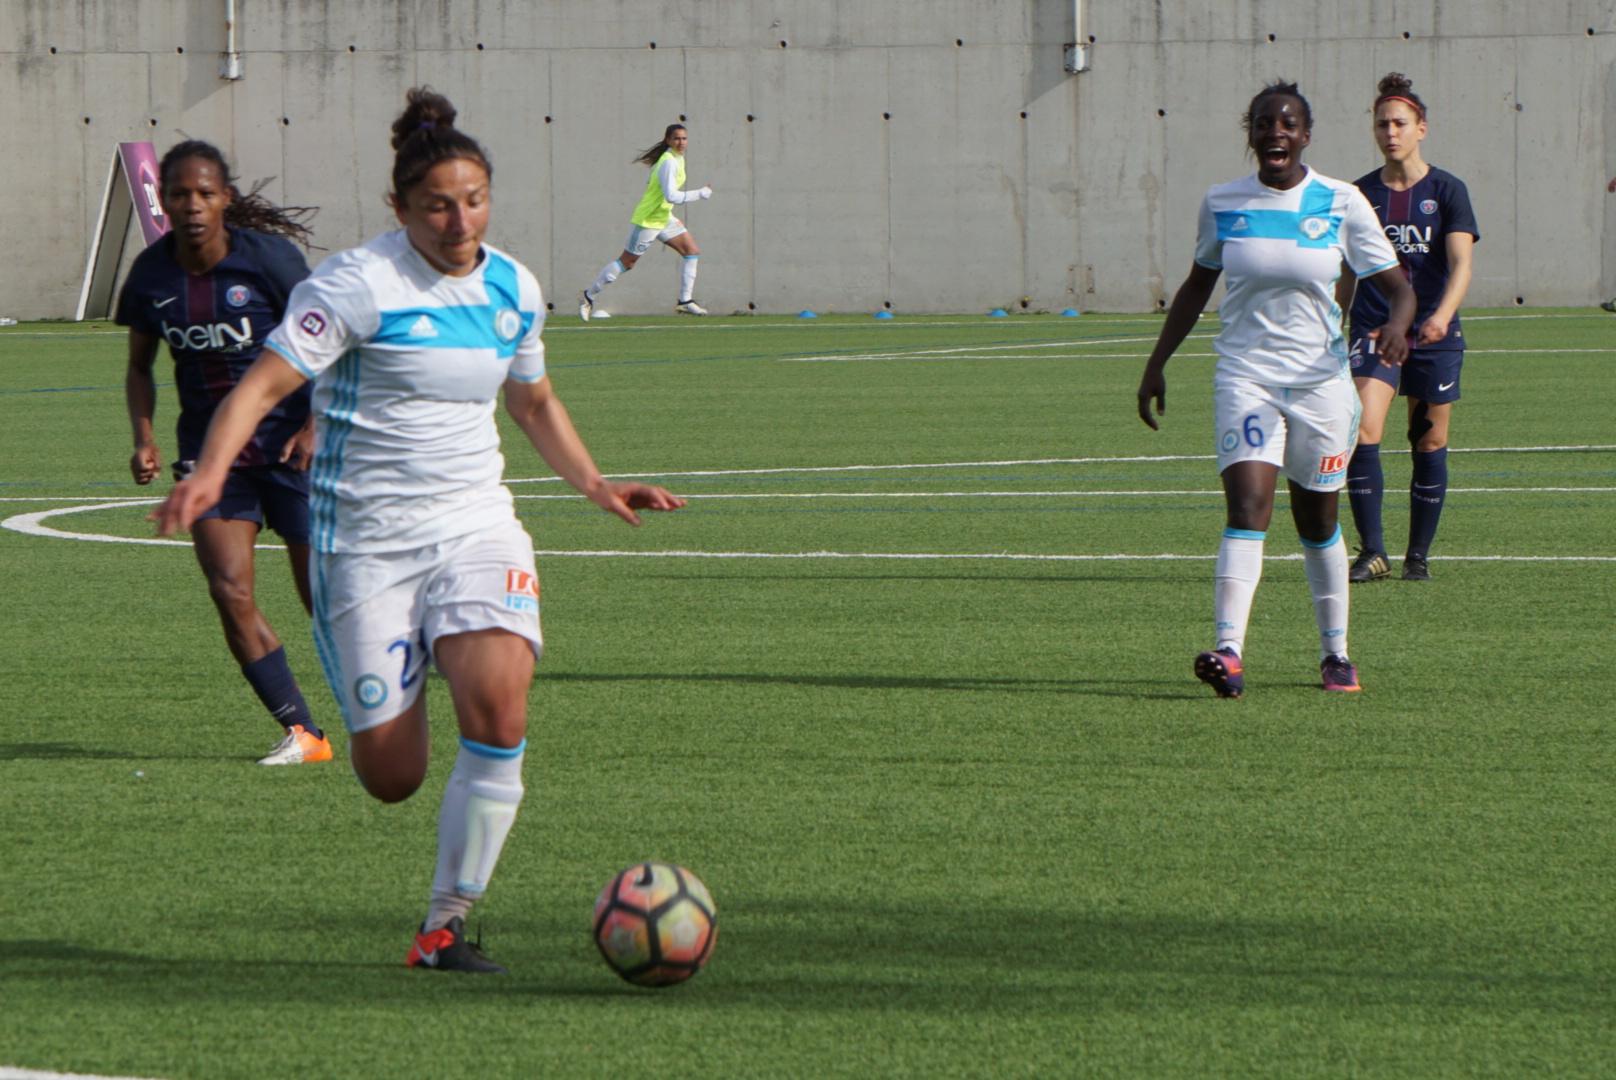 Yüceil a ouvert le score (photo footofeminin.fr)